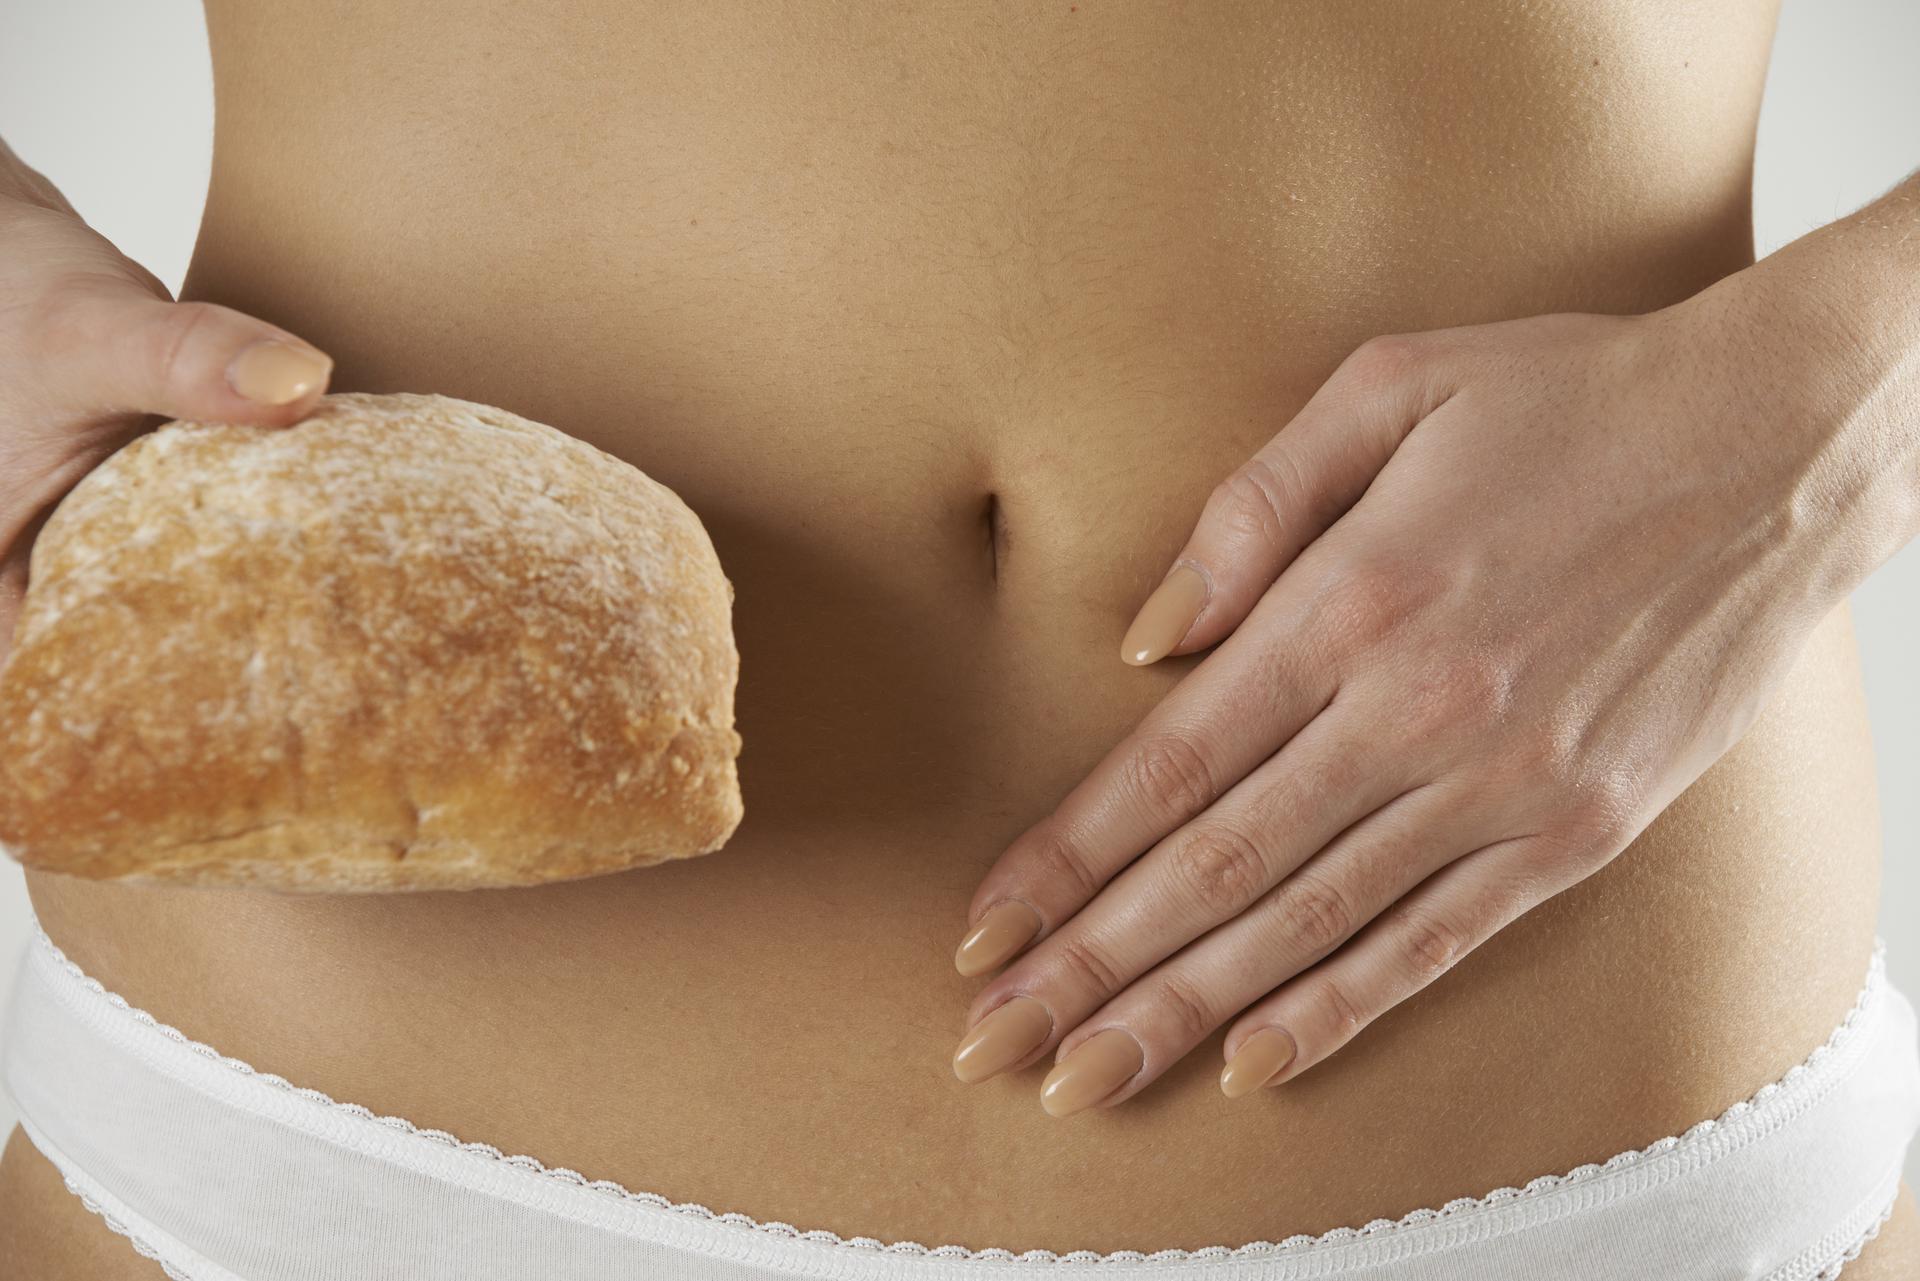 Kimler Glutensiz Beslenmeli